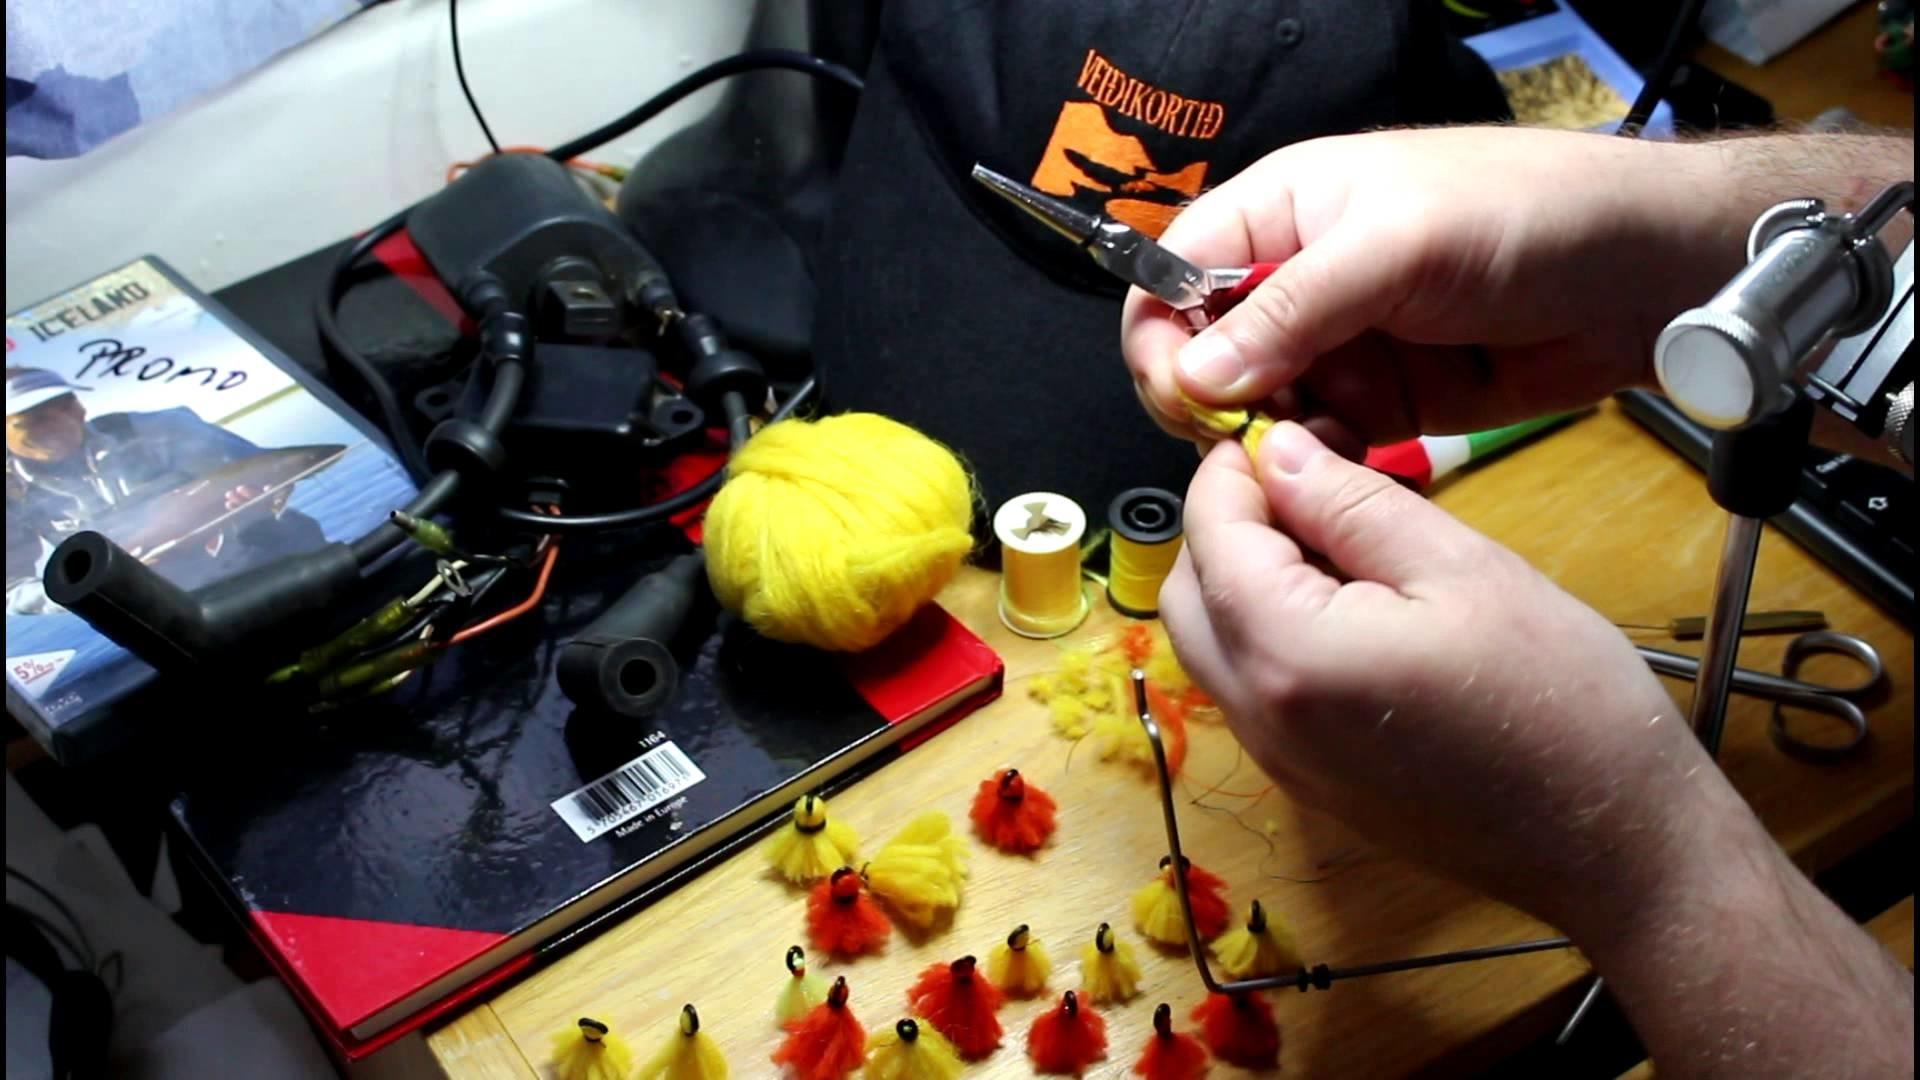 DIY Strike indicator for fly fishing - Version 2